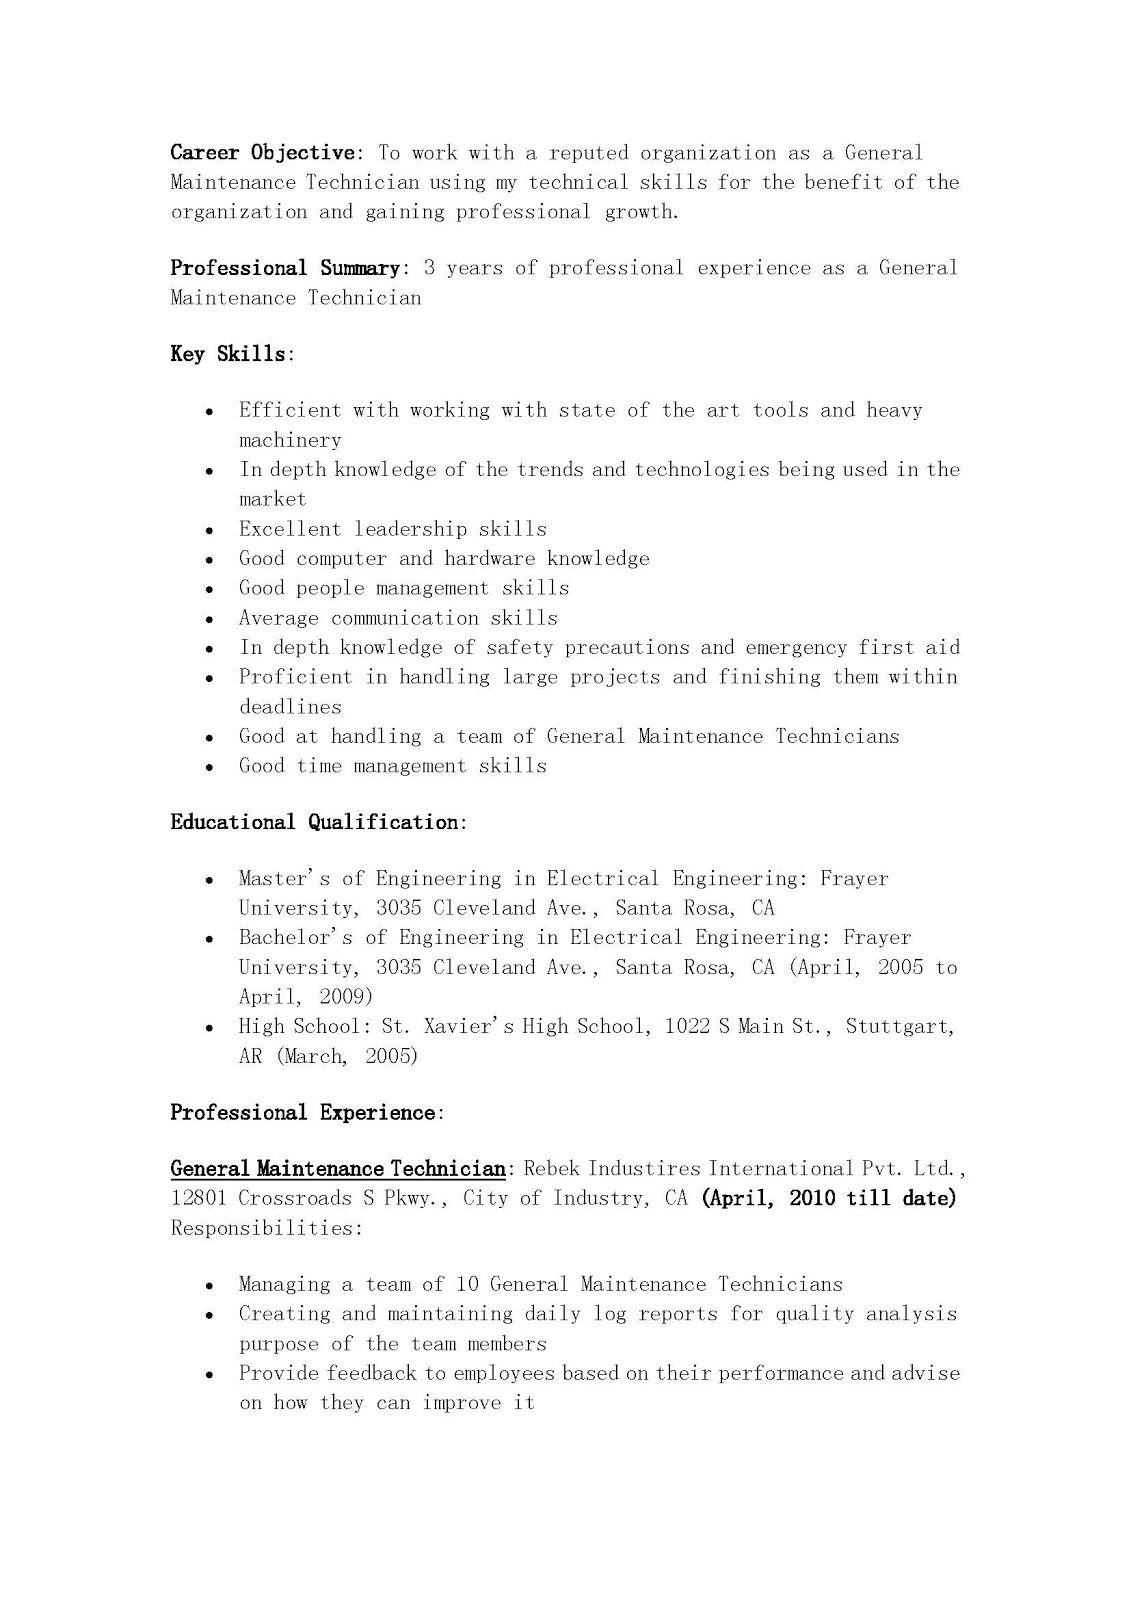 Apartment Maintenance Technician Resume Apartment Maintenance Technician Resume Summary Apartment Maintenance Technici Job Resume Examples Resume Skills Resume